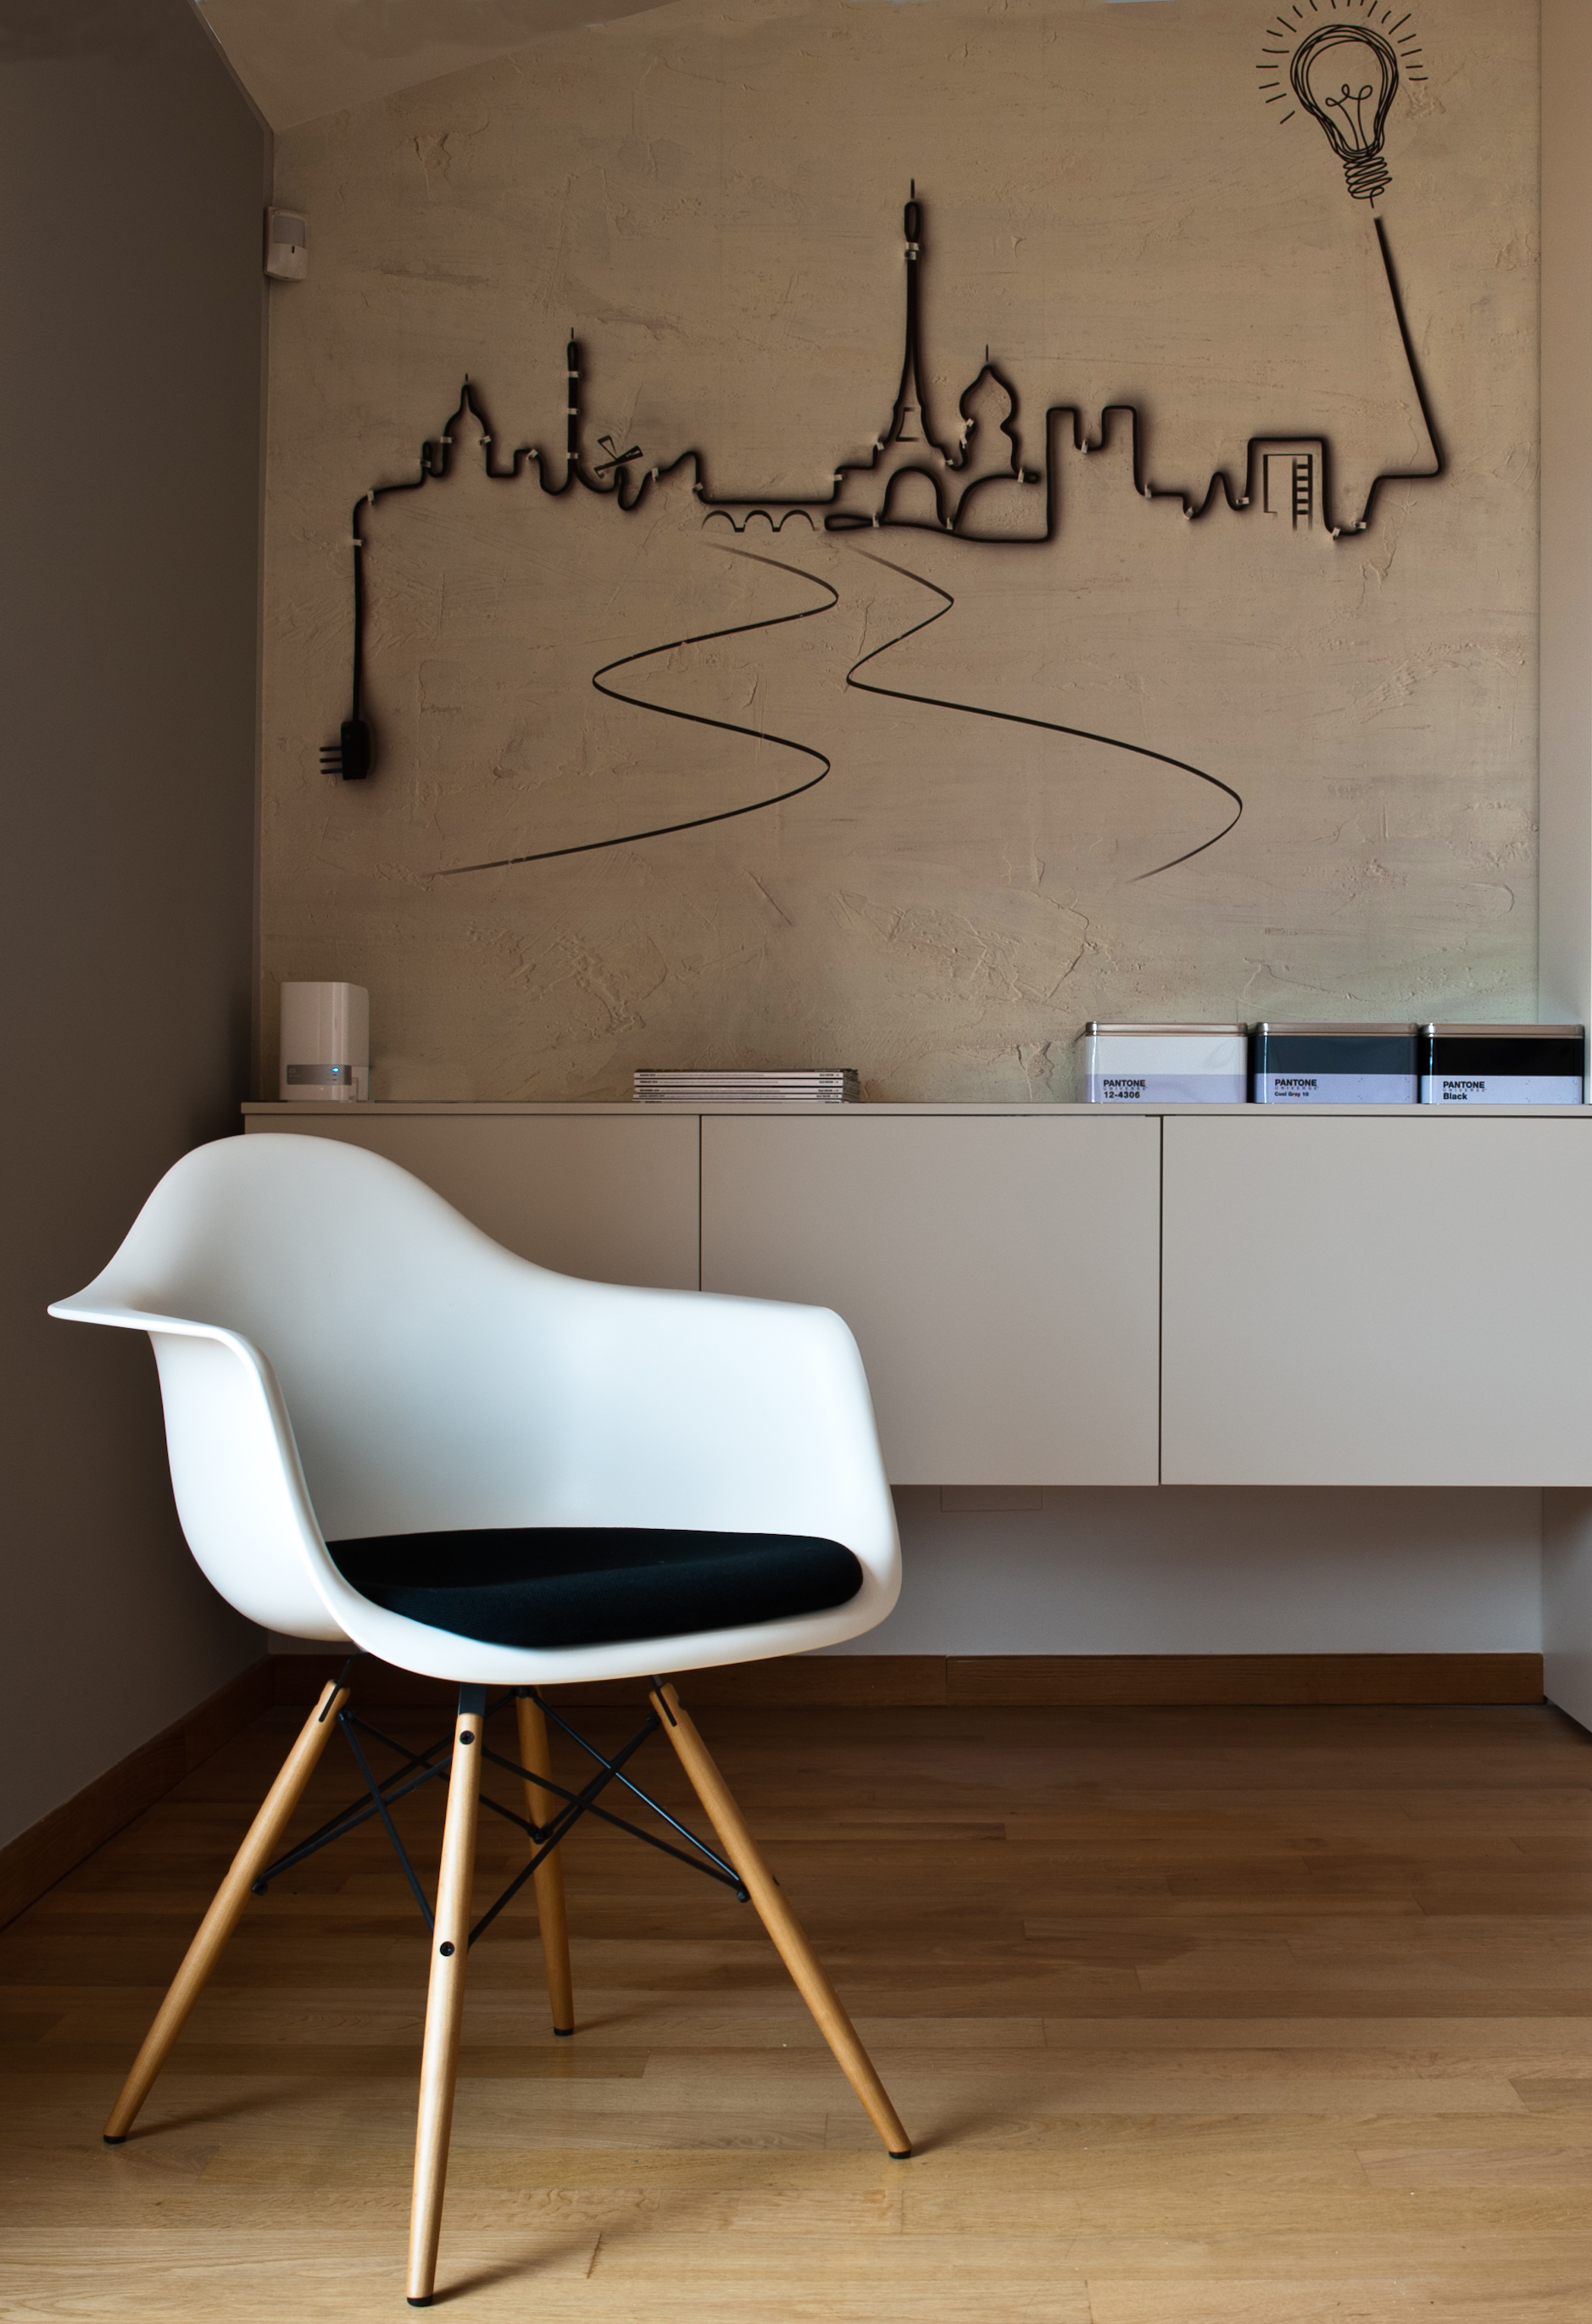 Daw eames plastic chair sedia icona di stile ed eleganza for Sedia vitra eames